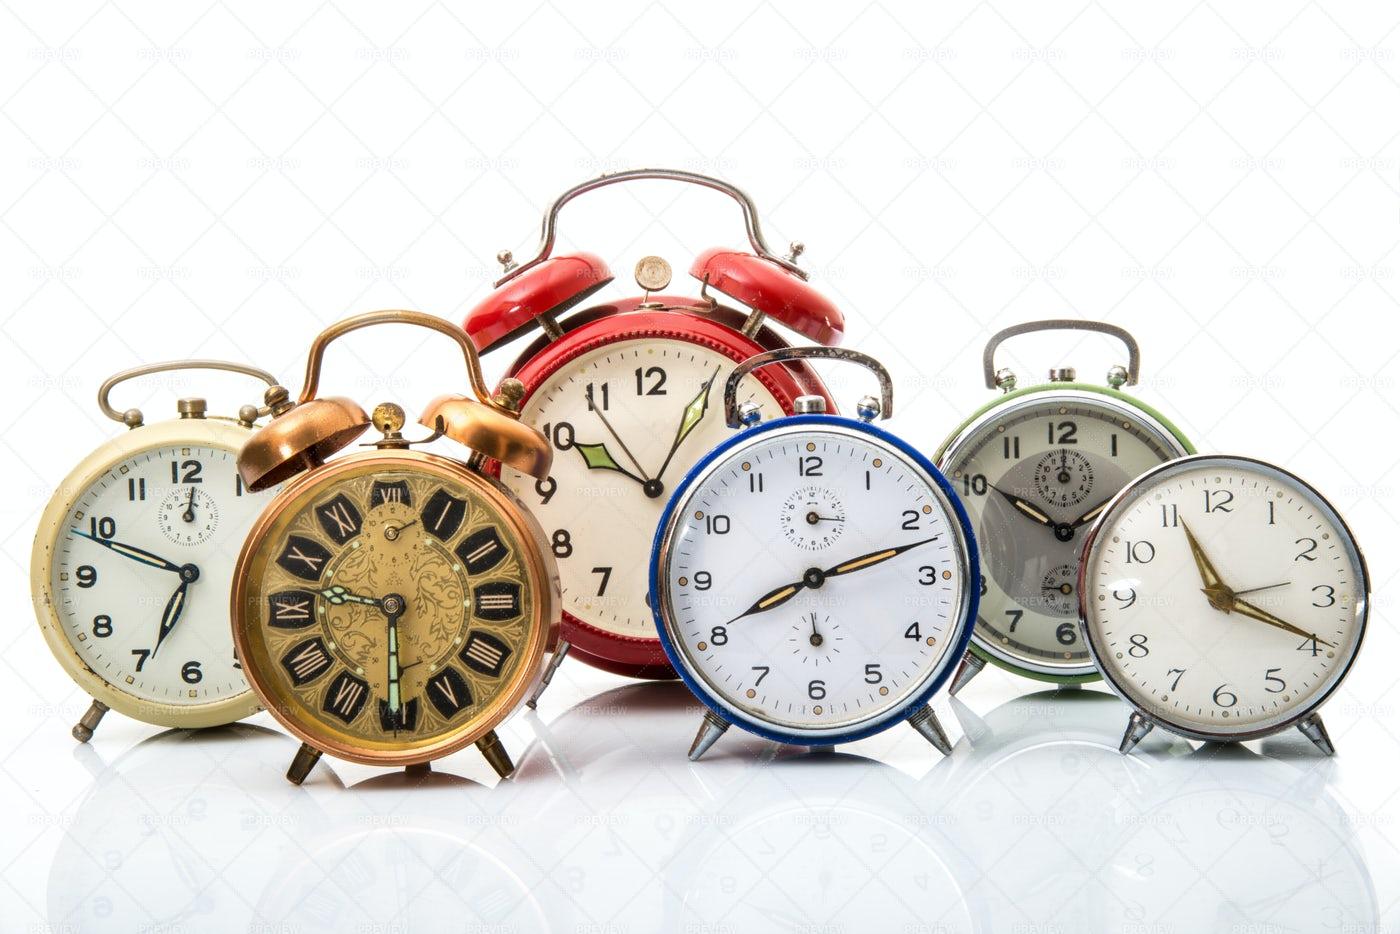 Vintage Alarm Clock: Stock Photos